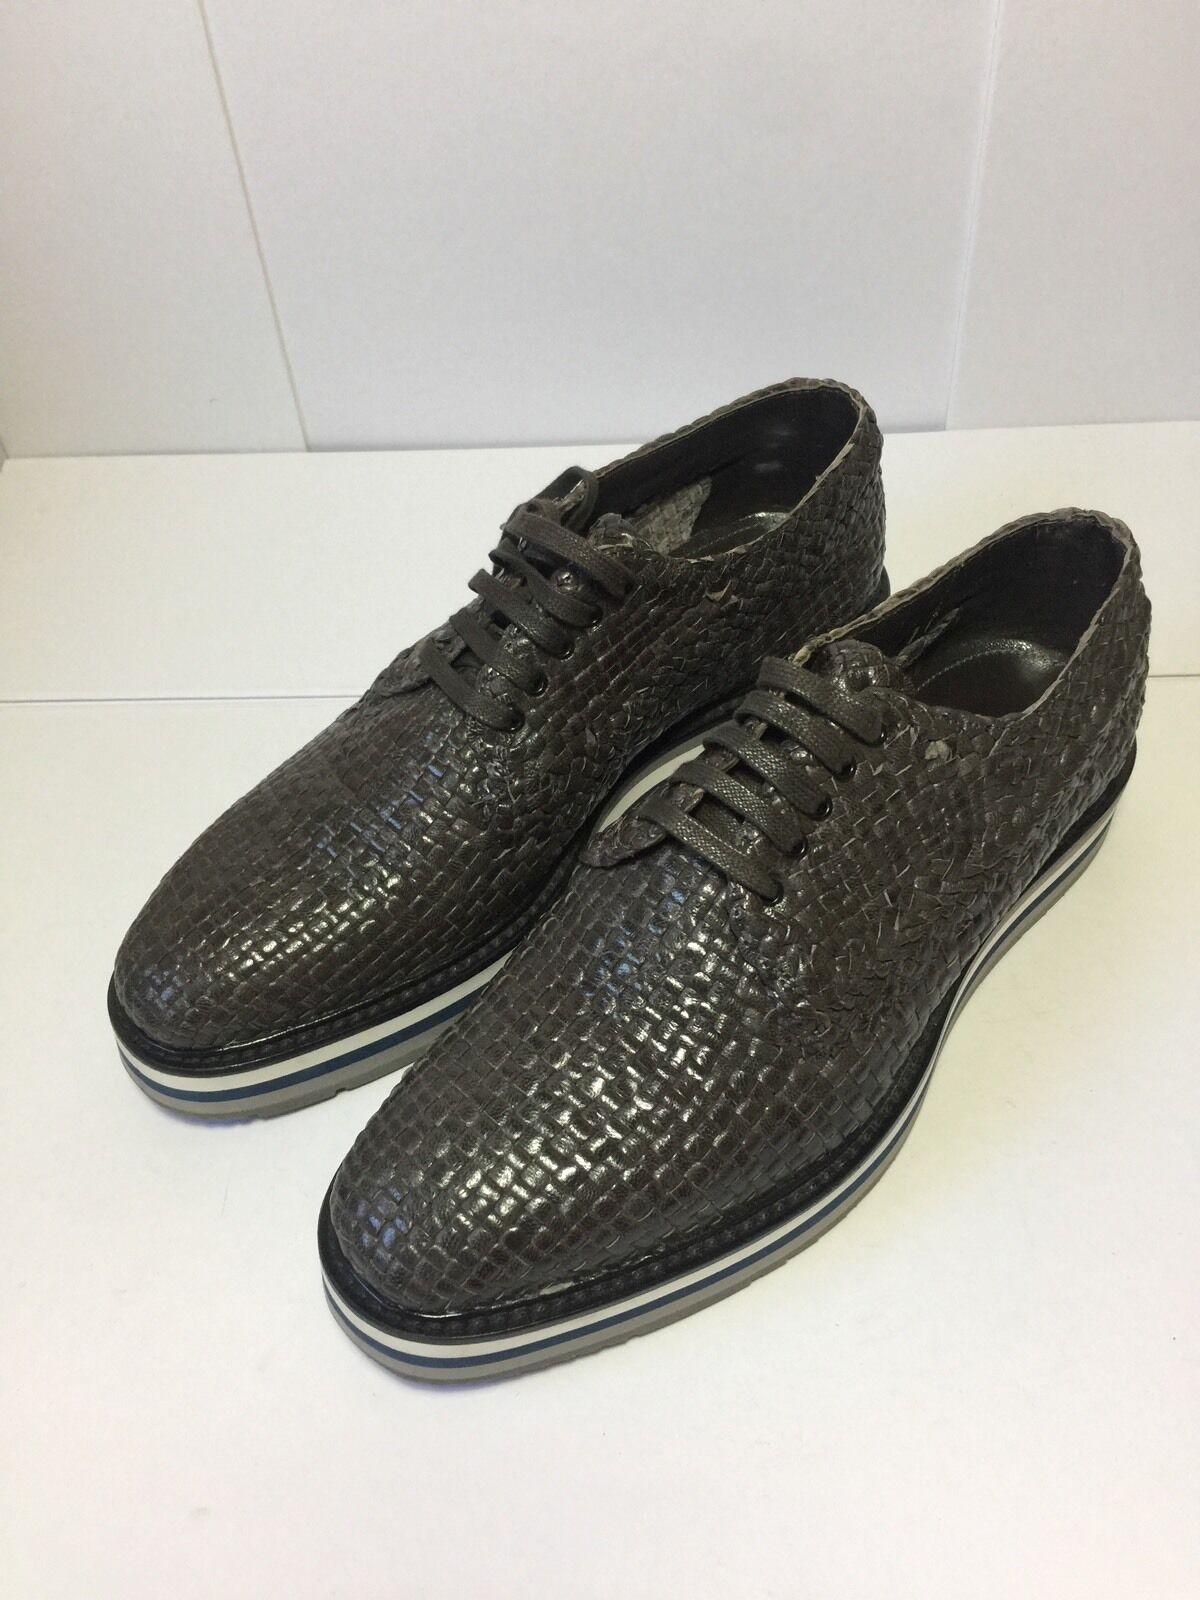 =RARE= PRADA Men's Brown Woven Leather Intrecciato Oxfords Platform shoes US 8